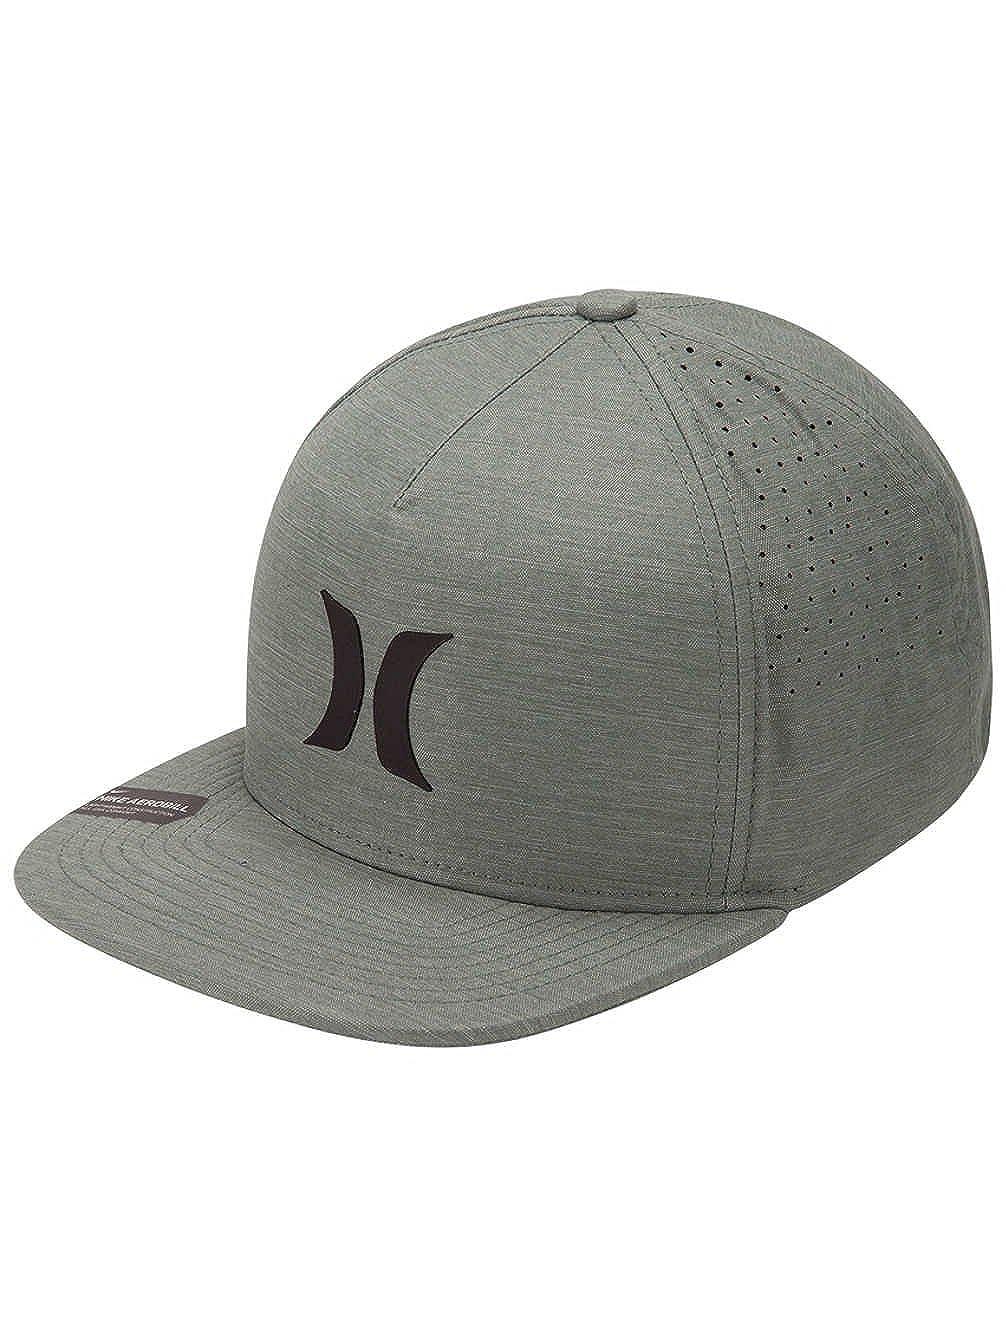 de0eb511eb9ad Amazon.com  Hurley Dri-Fit Icon 4.0 Hat - Clay Green Black  Clothing